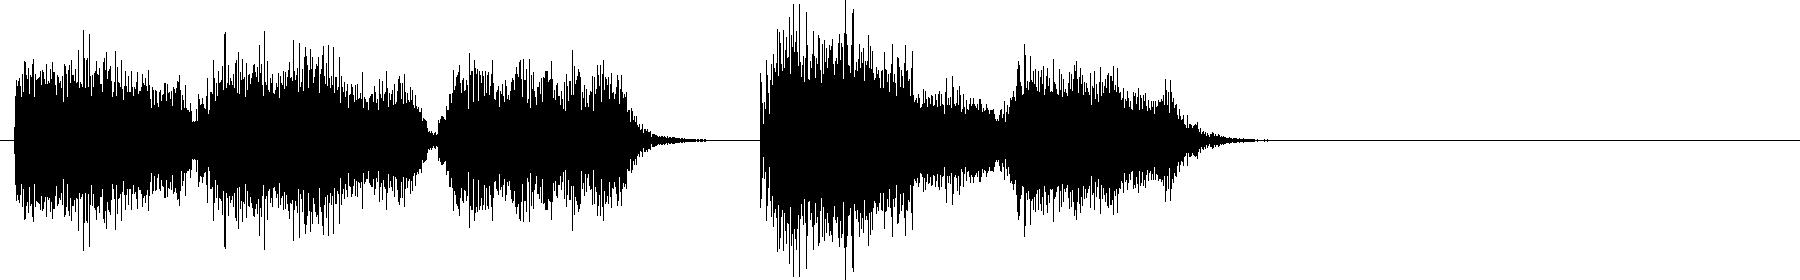 Breakbeat vocals sample from future funk squad epic sound score.